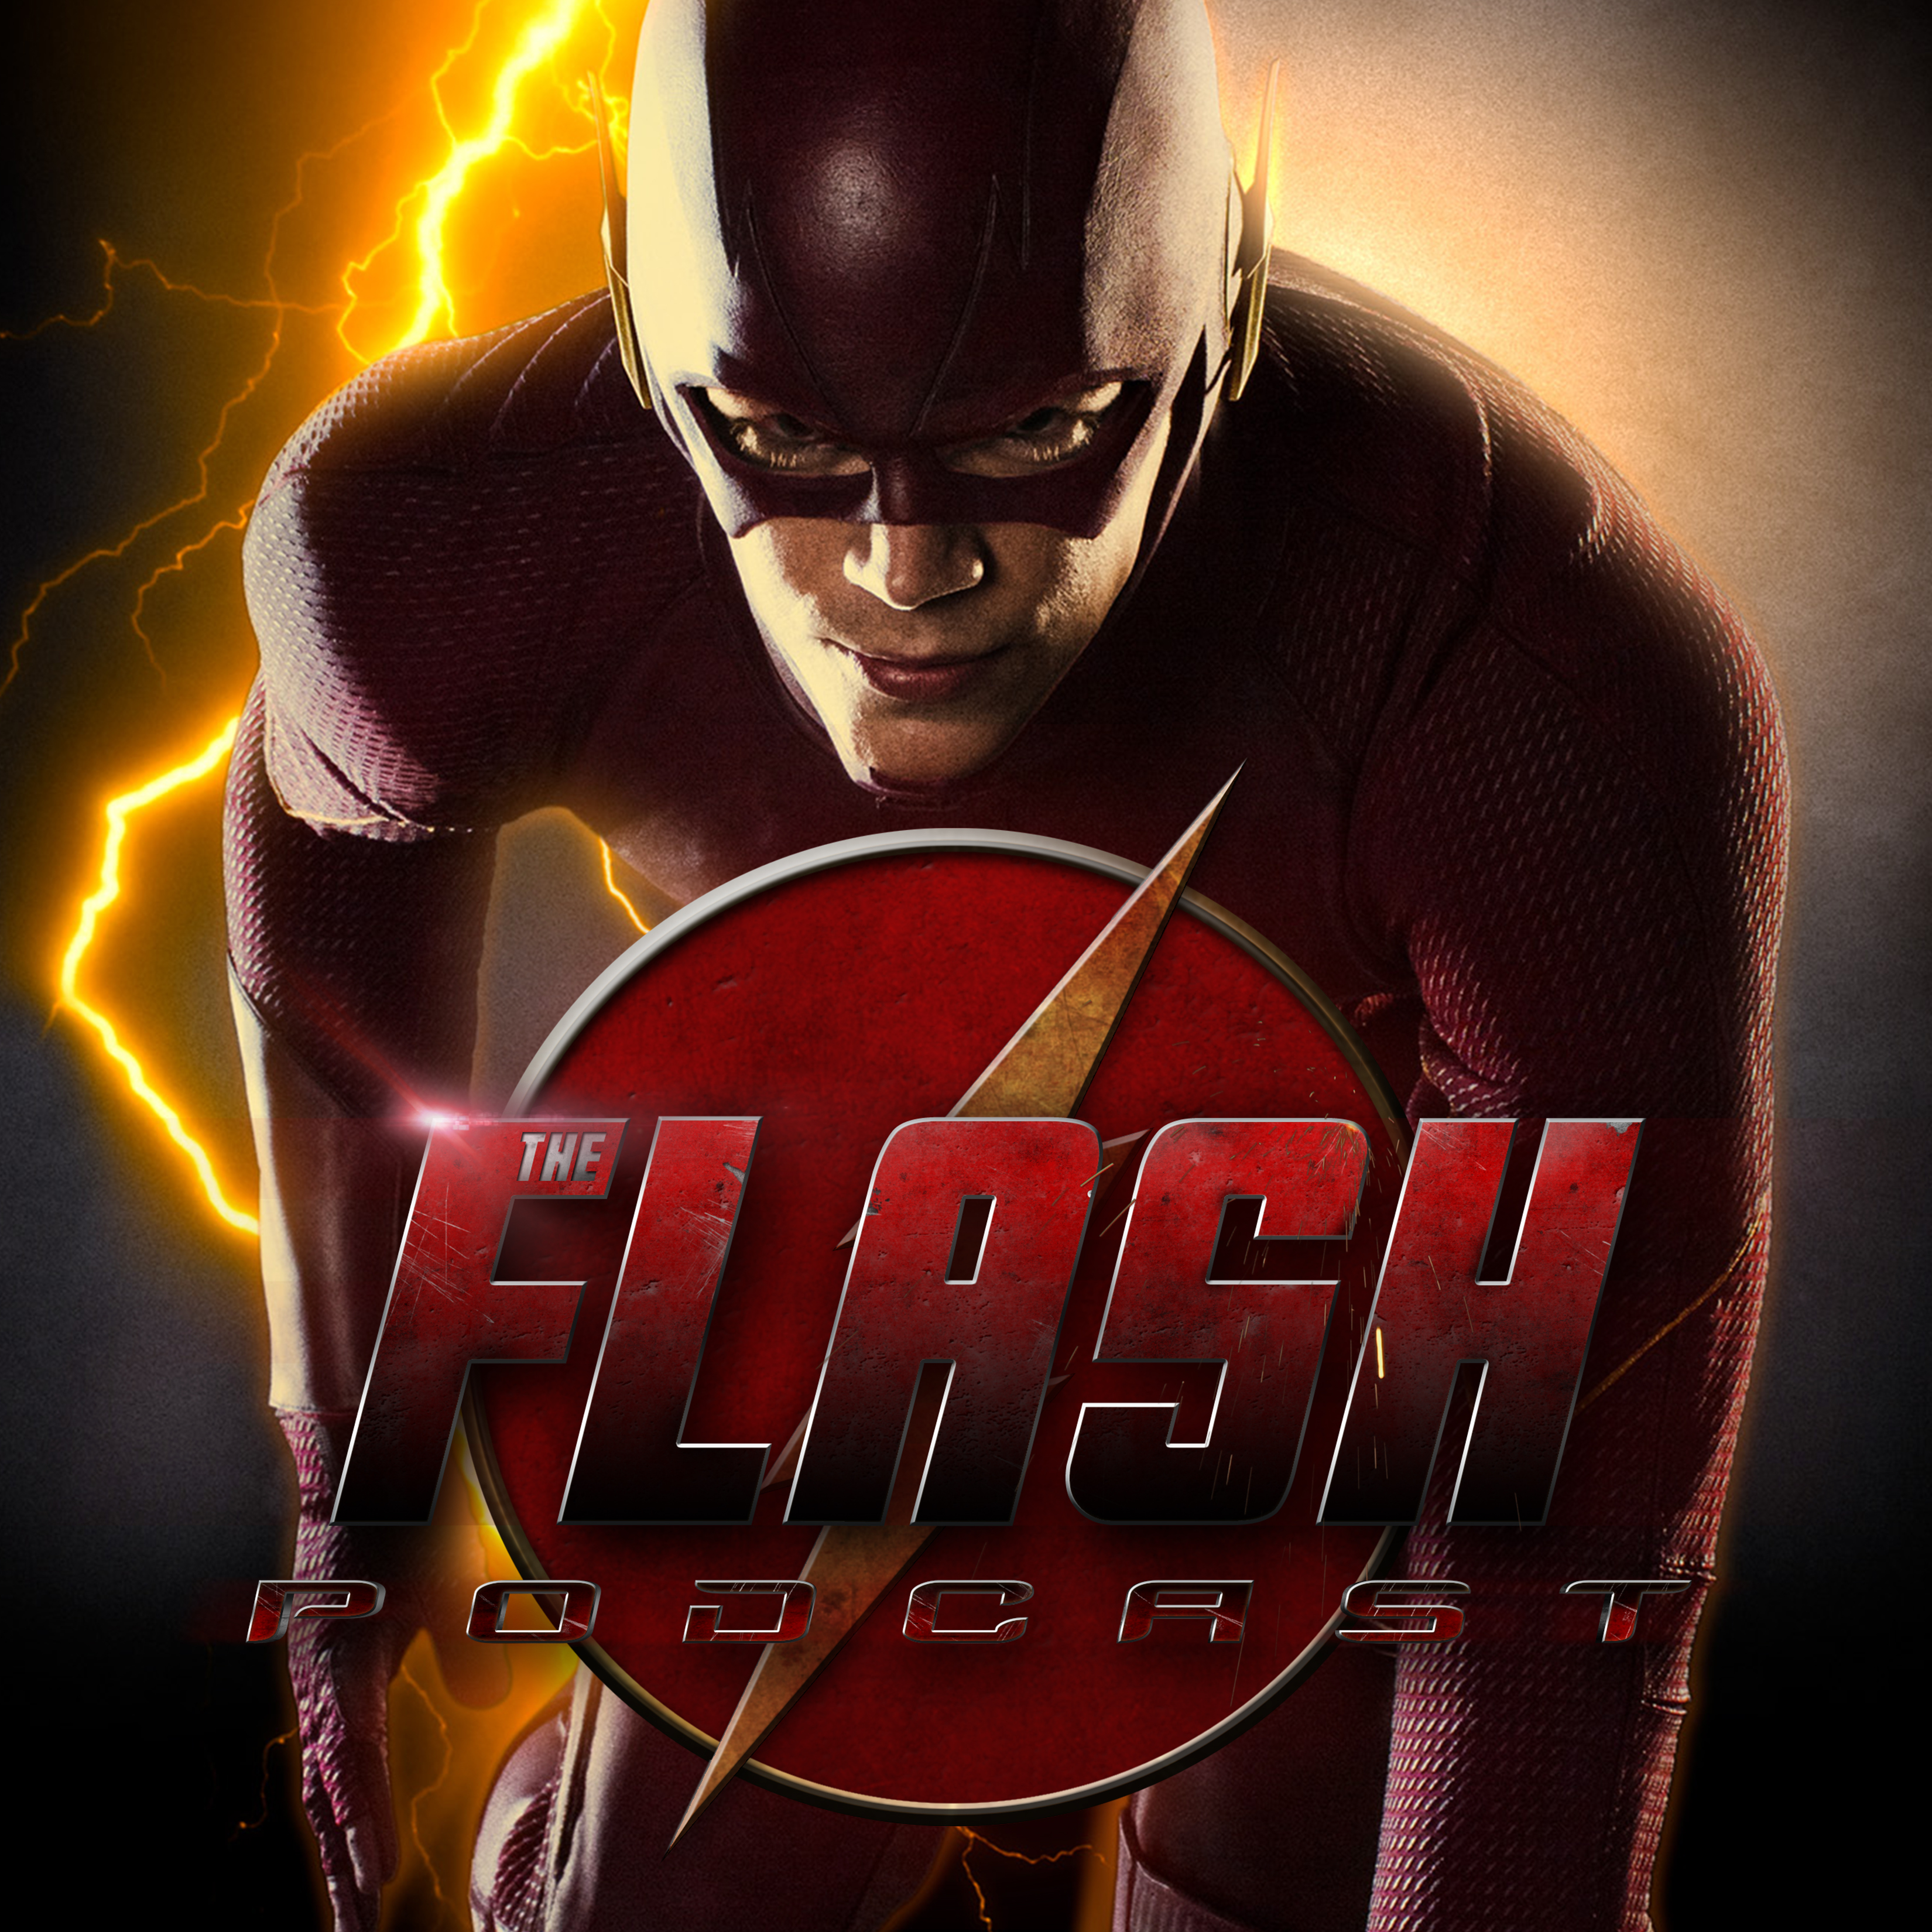 The Flash Podcast Special Edition 02 - Season 1 So far